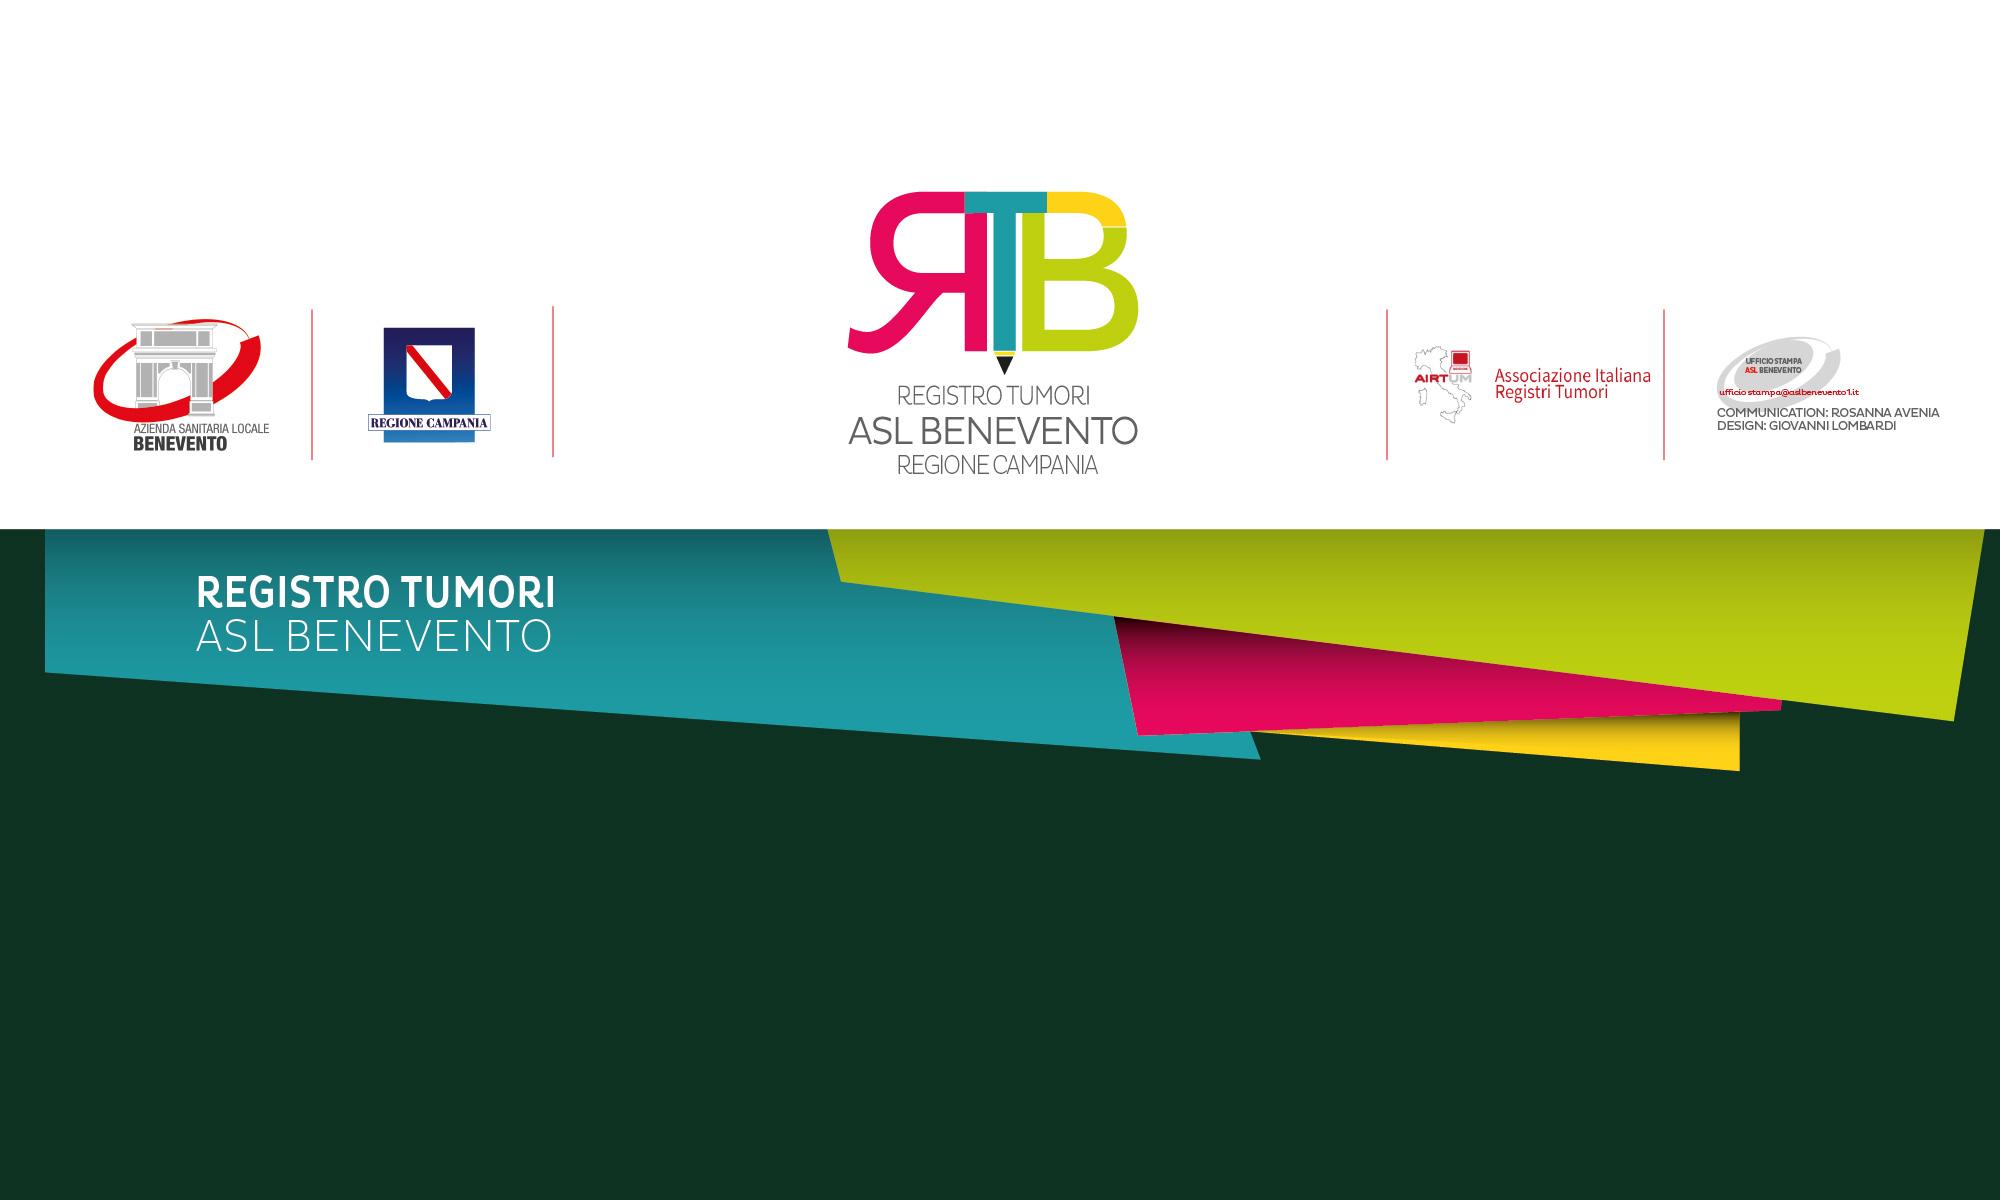 Registro Tumori ASL Benevento